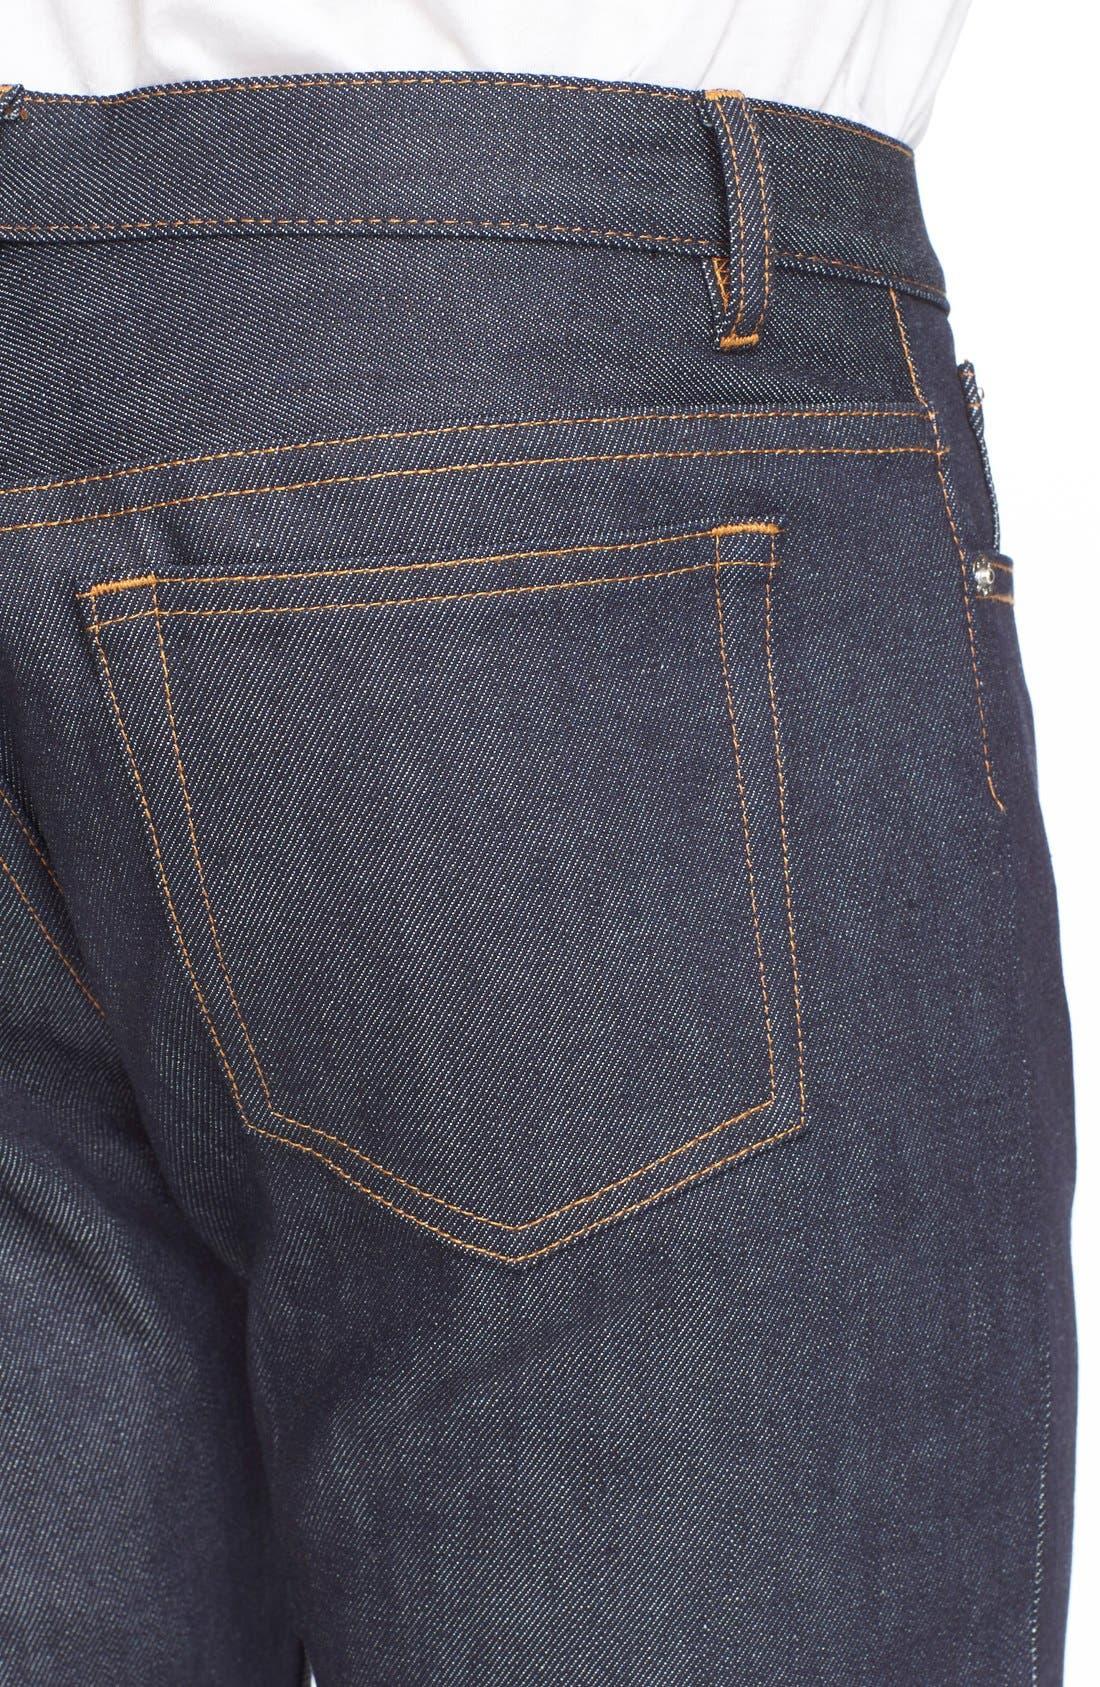 Alternate Image 4  - A.P.C. 'Petite New Standard' Skinny Fit Jeans (Indigo)